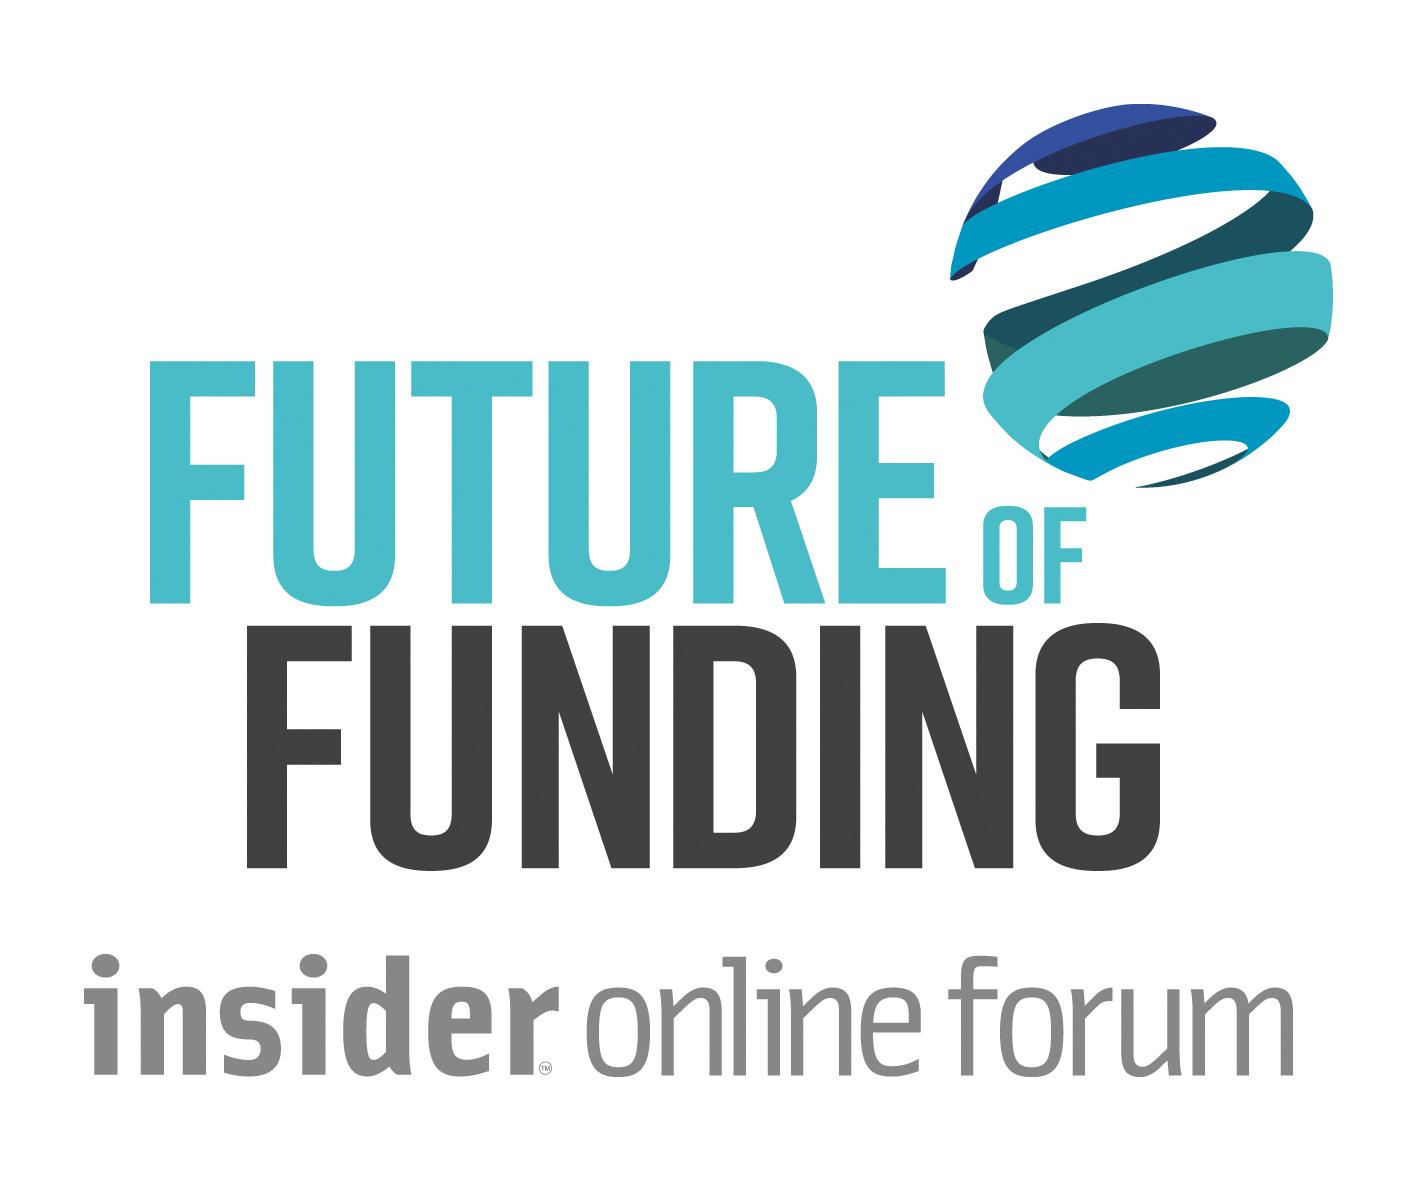 Future of Funding